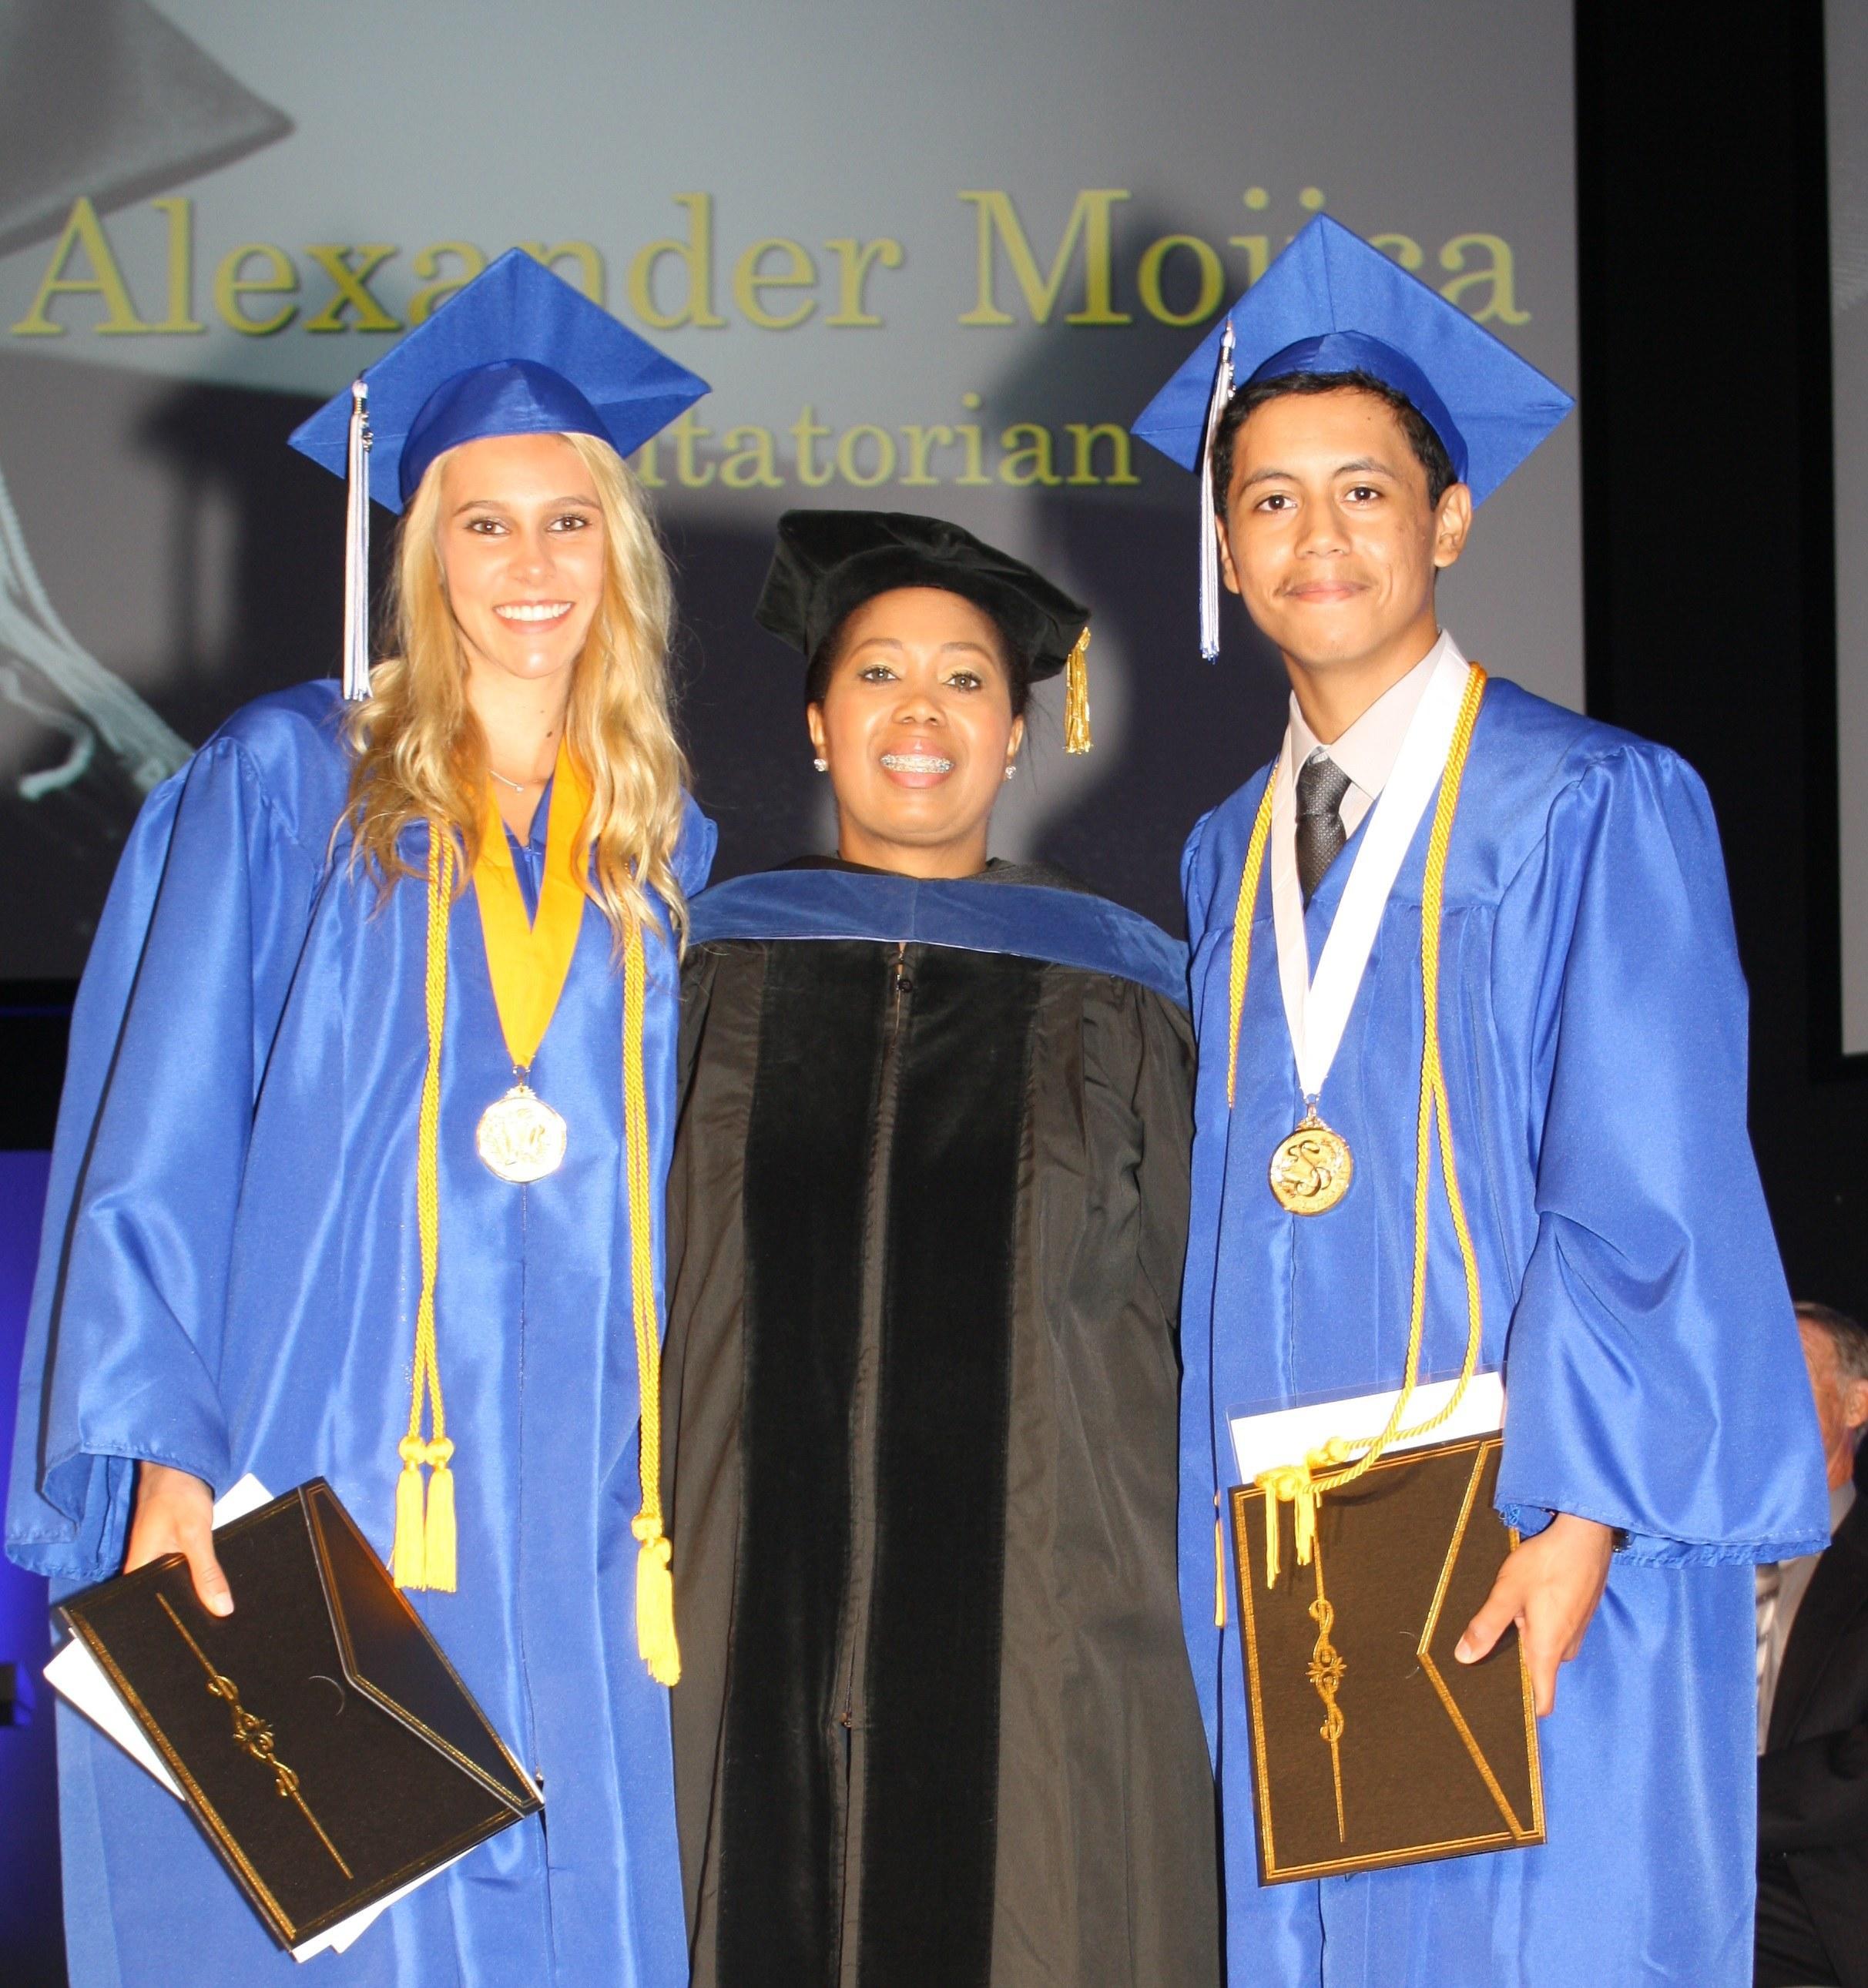 Valedictorian and Salutatorian during the 2016 Graduation at Texas Success Academy